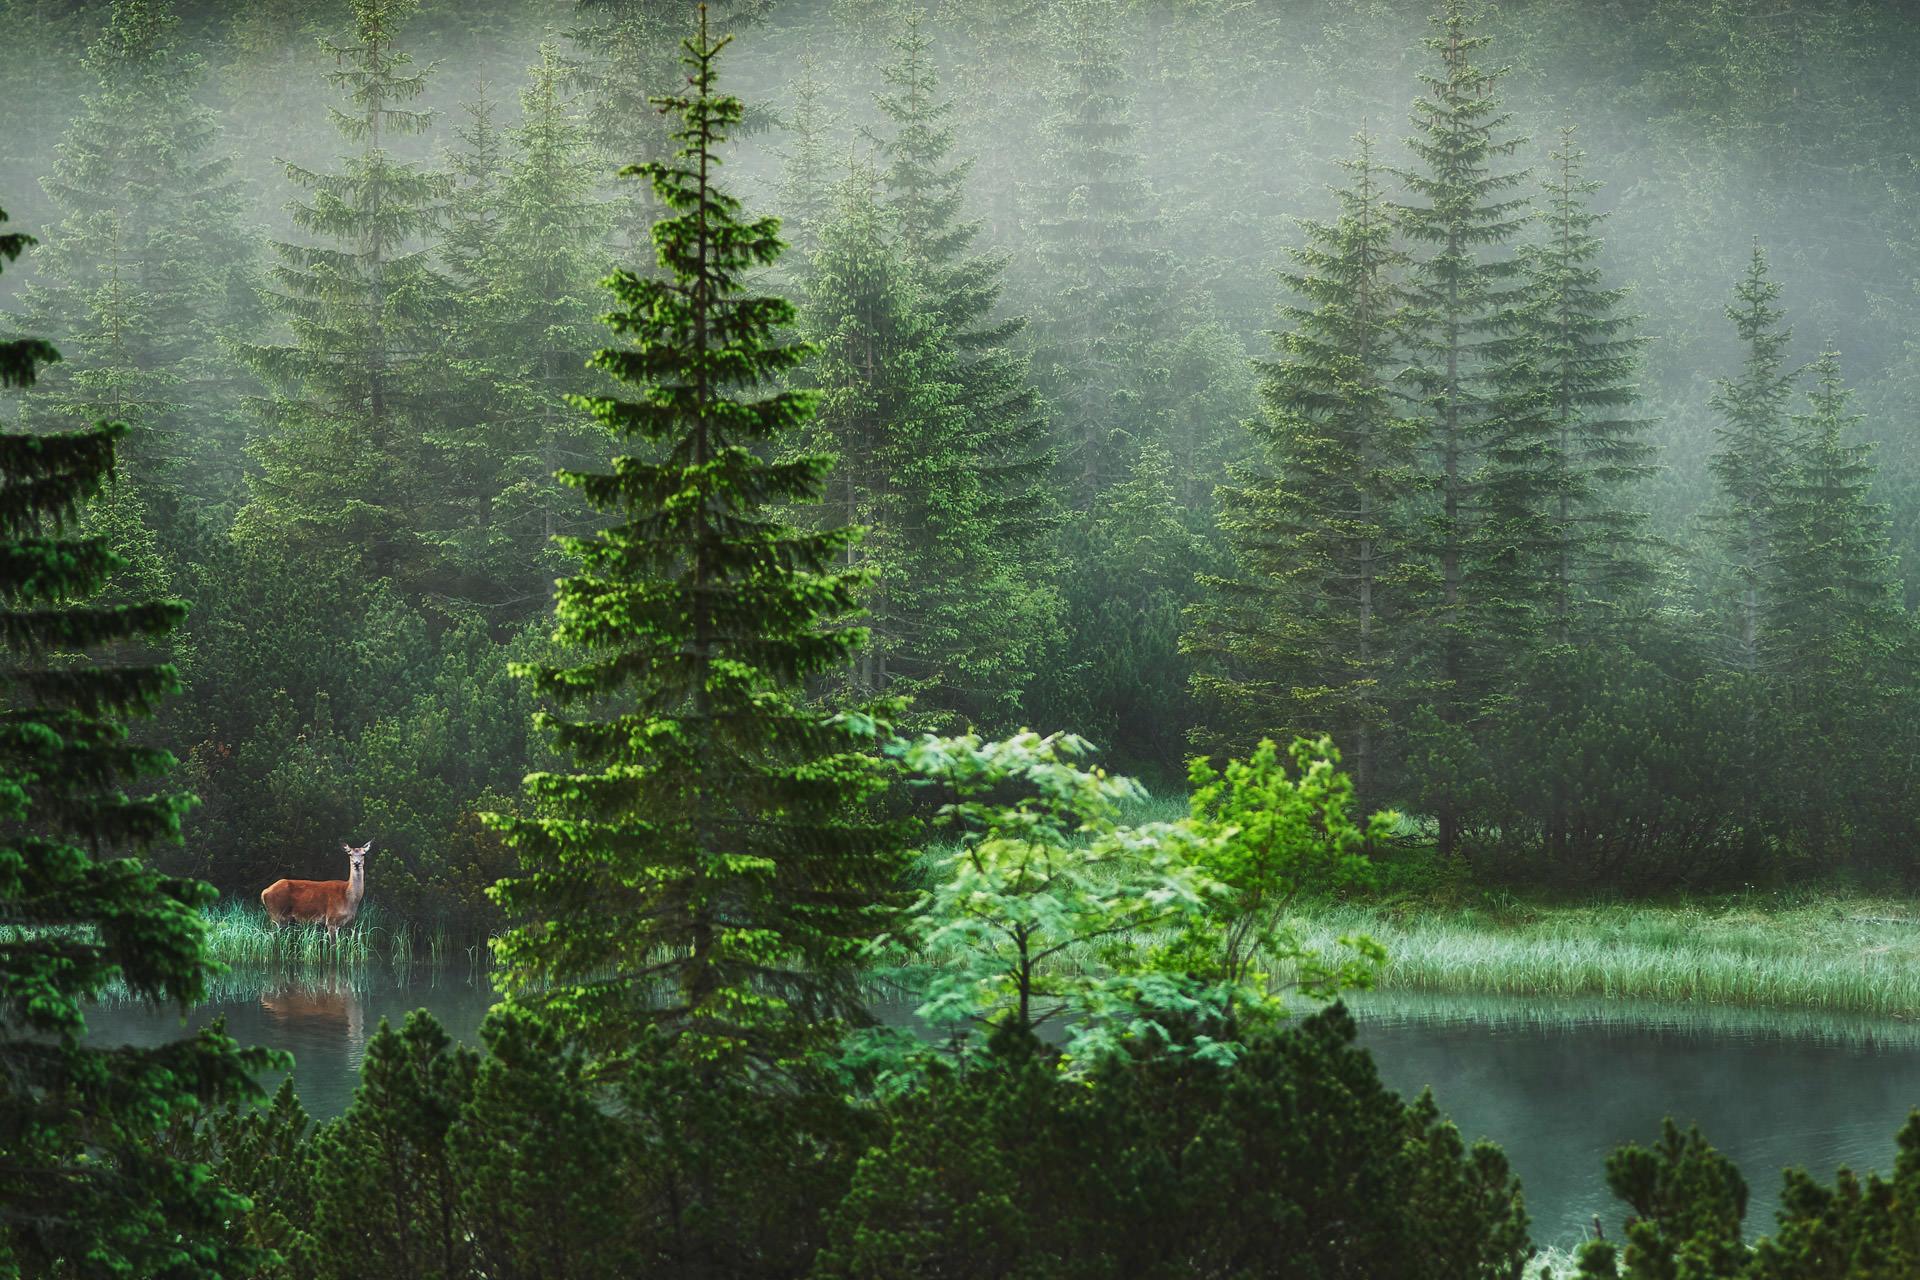 Tatrzanski Park Narodowy sarna zdjecia Tatr